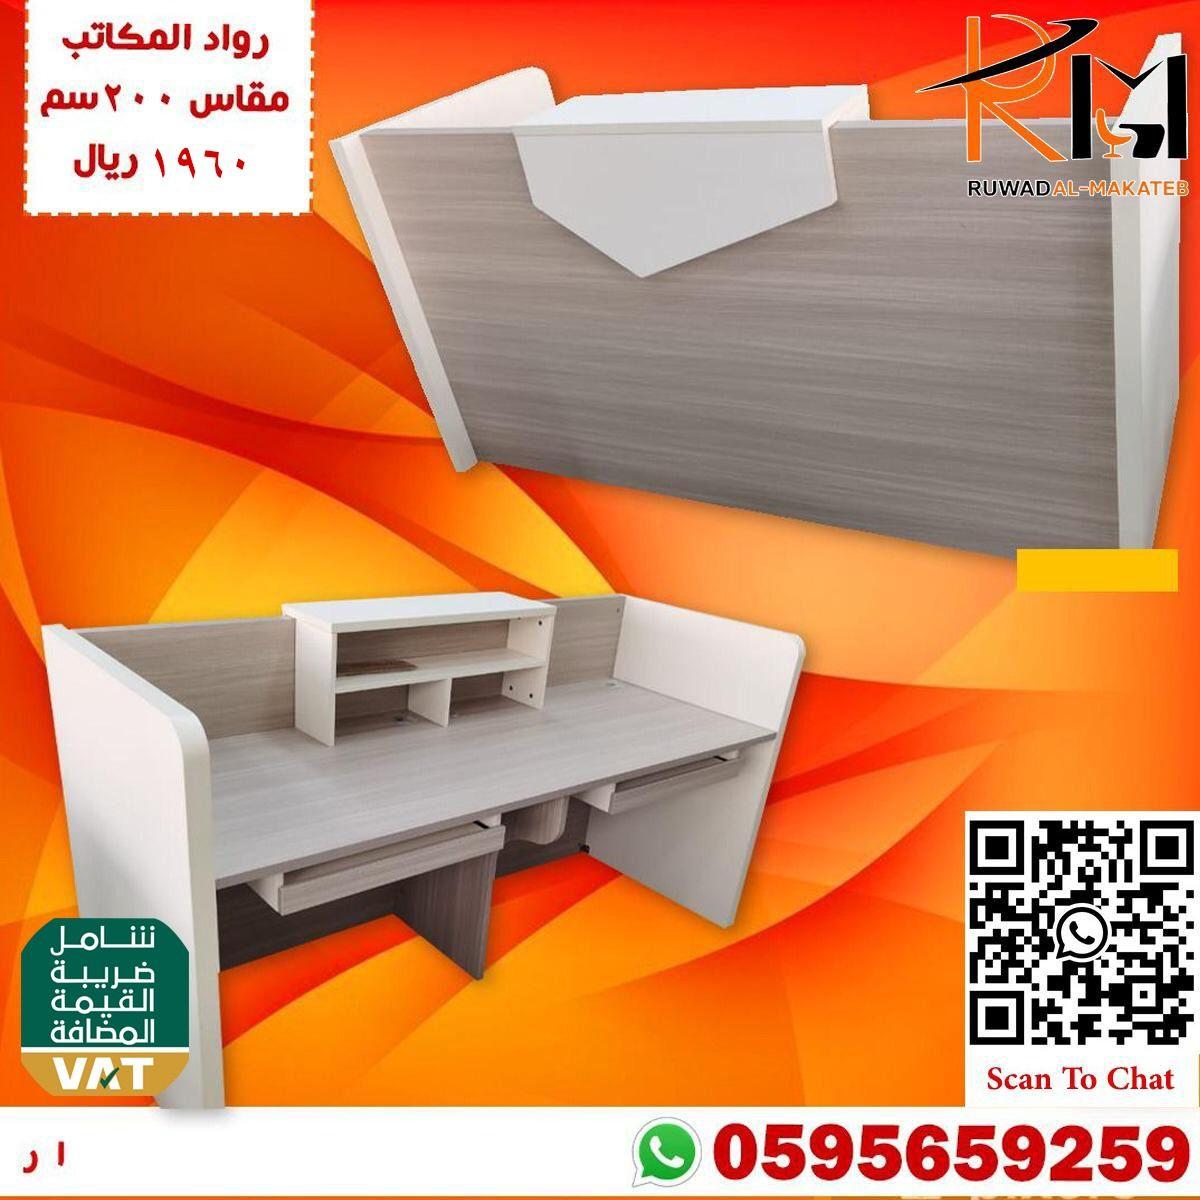 كونتر شيك In 2021 Home Decor Floating Nightstand Furniture